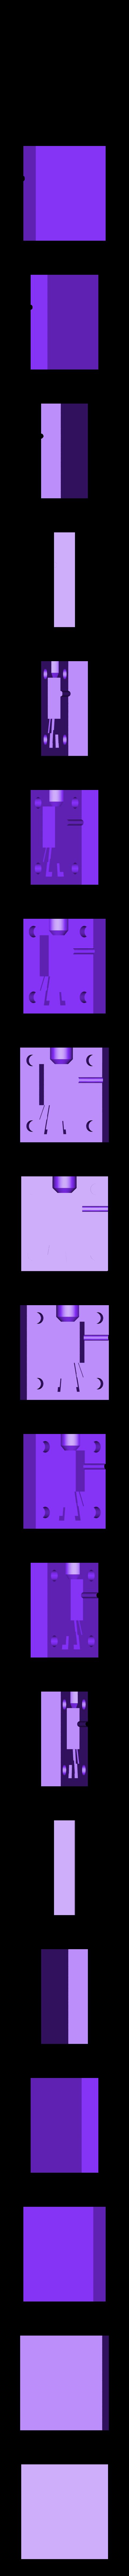 plrmoldbottom.stl Download free STL file MineCraft Player Hotglue injection mold • 3D printing object, Qelorliss